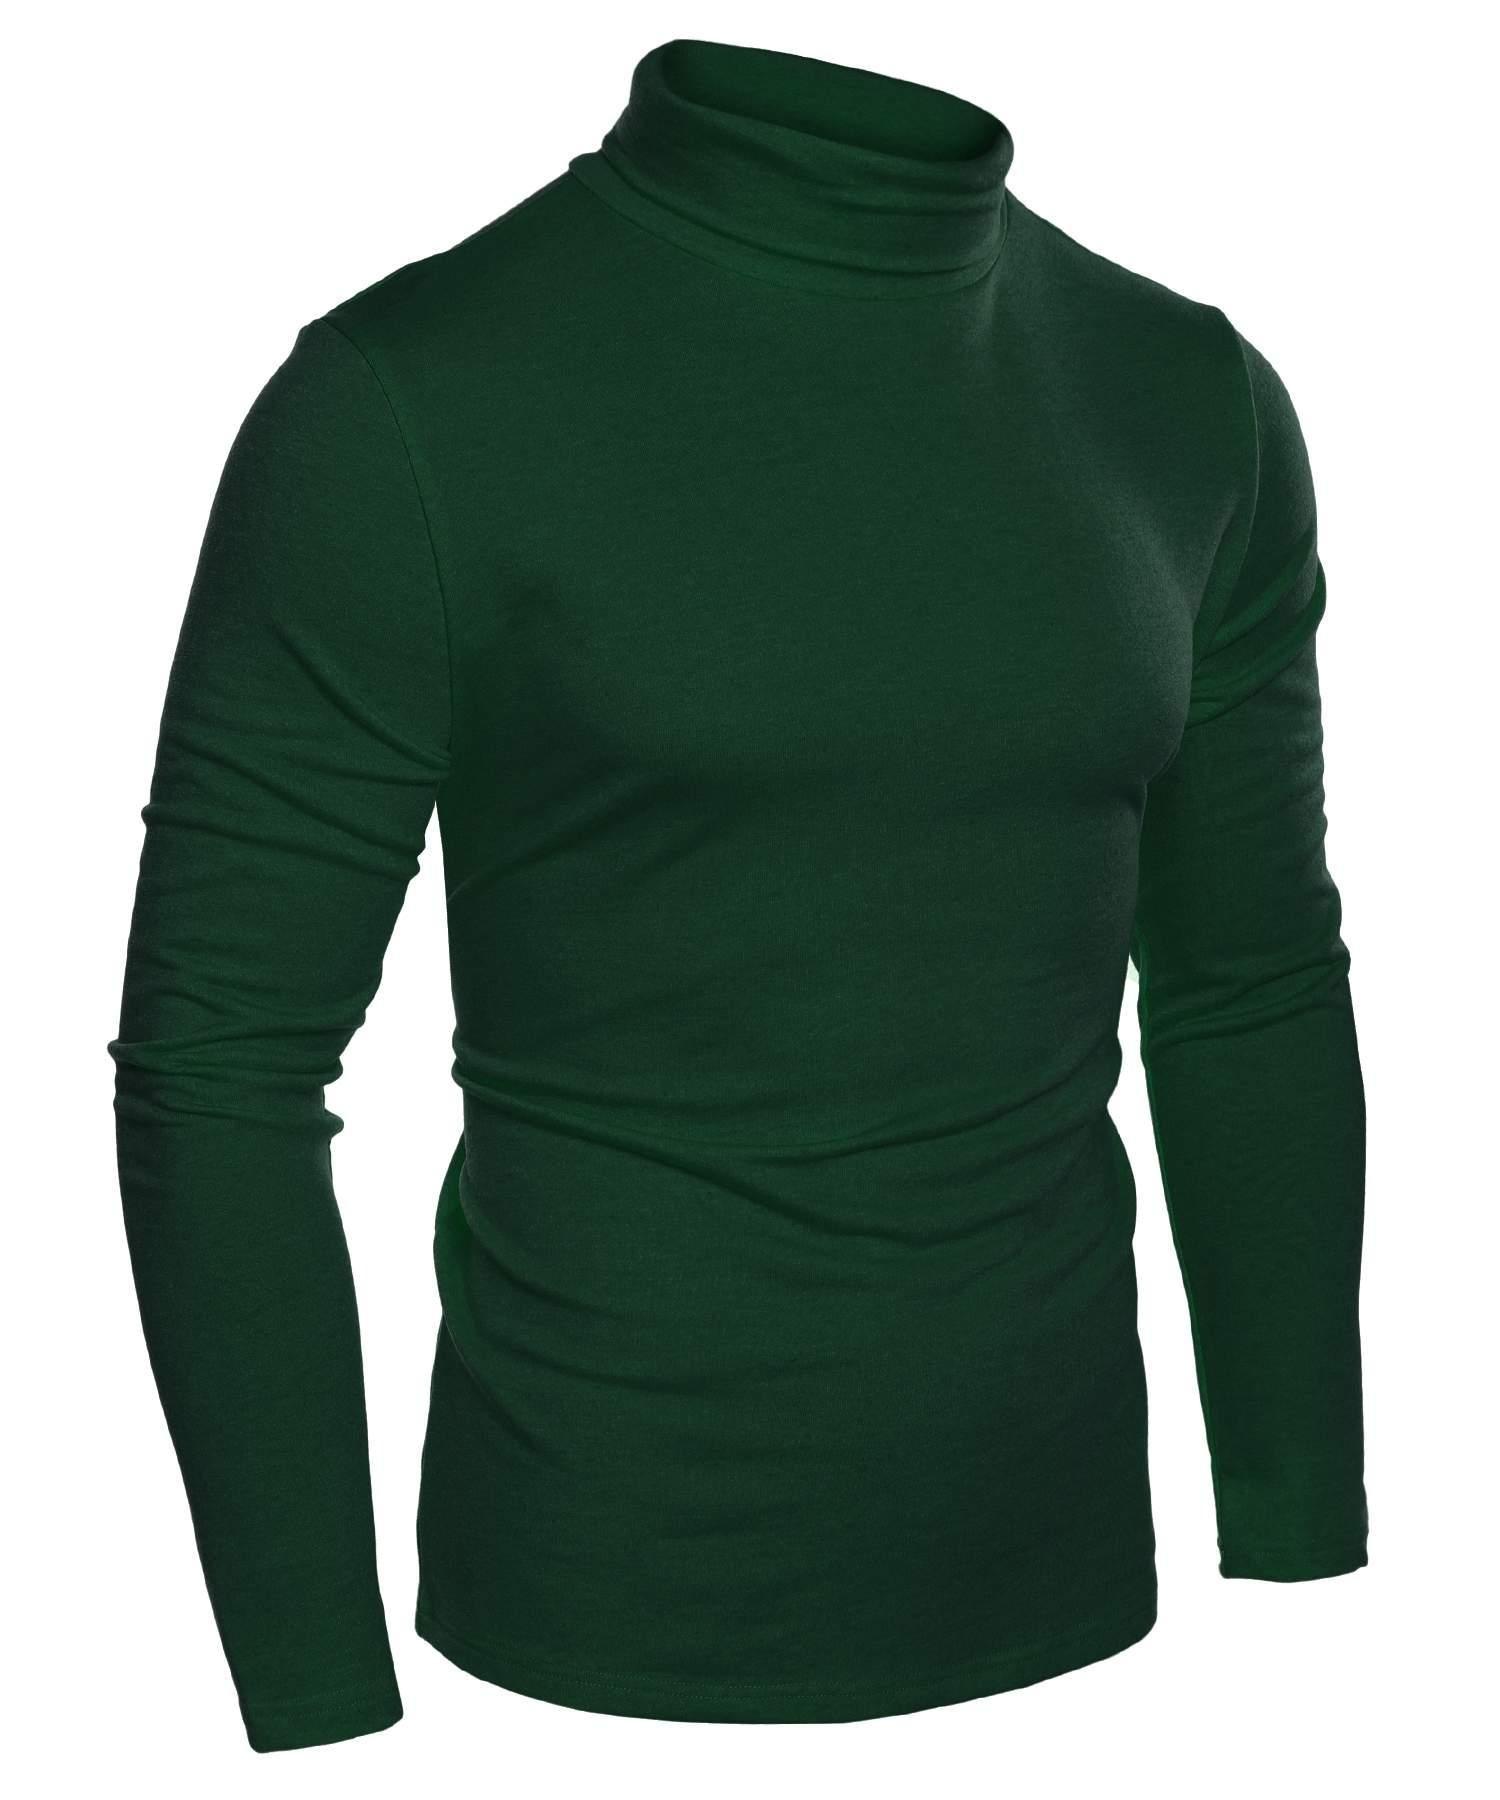 Bifast Men's Shirt Long Sleeve T-Shirt Lightweight Turtleneck Slim Fit Tops